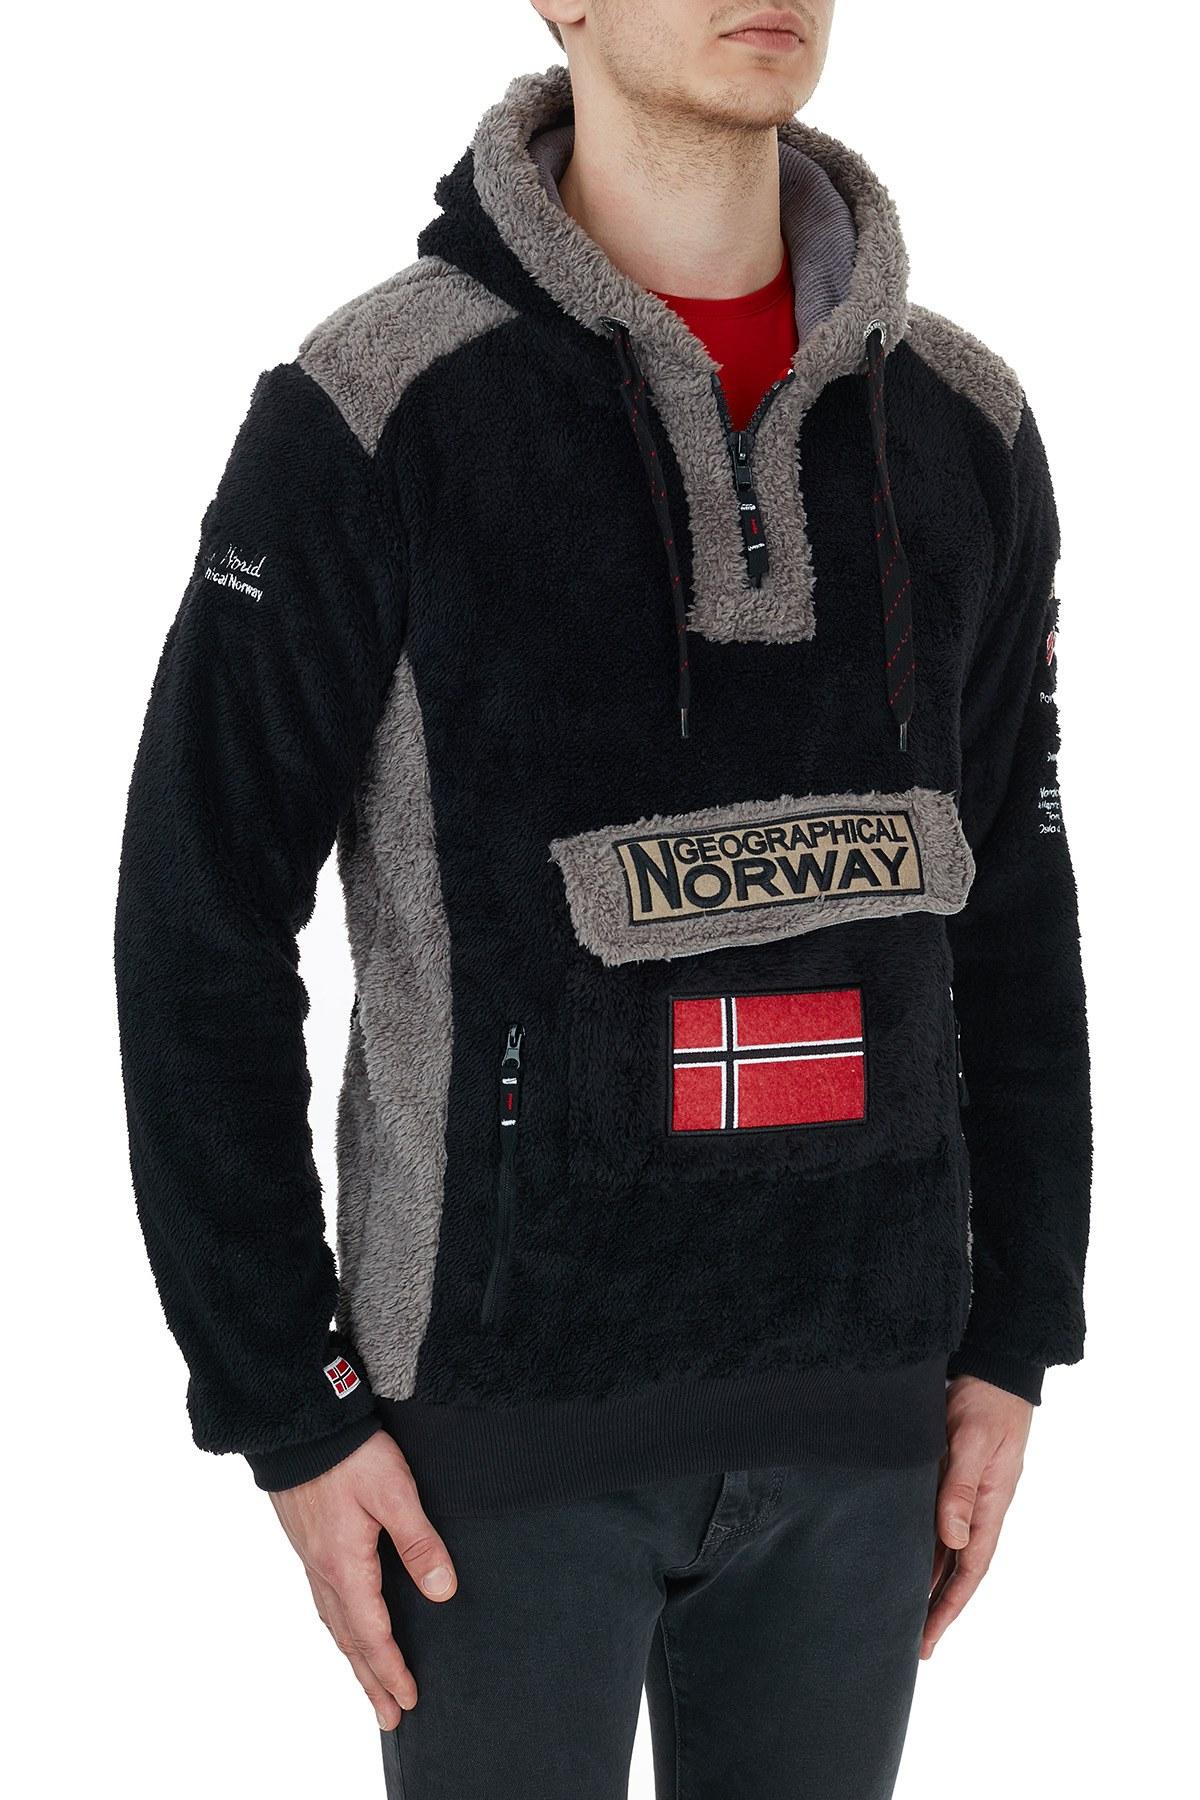 Norway Geographical Kapüşonlu Outdoor Polar Erkek Sweat GYMCLASS E SİYAH